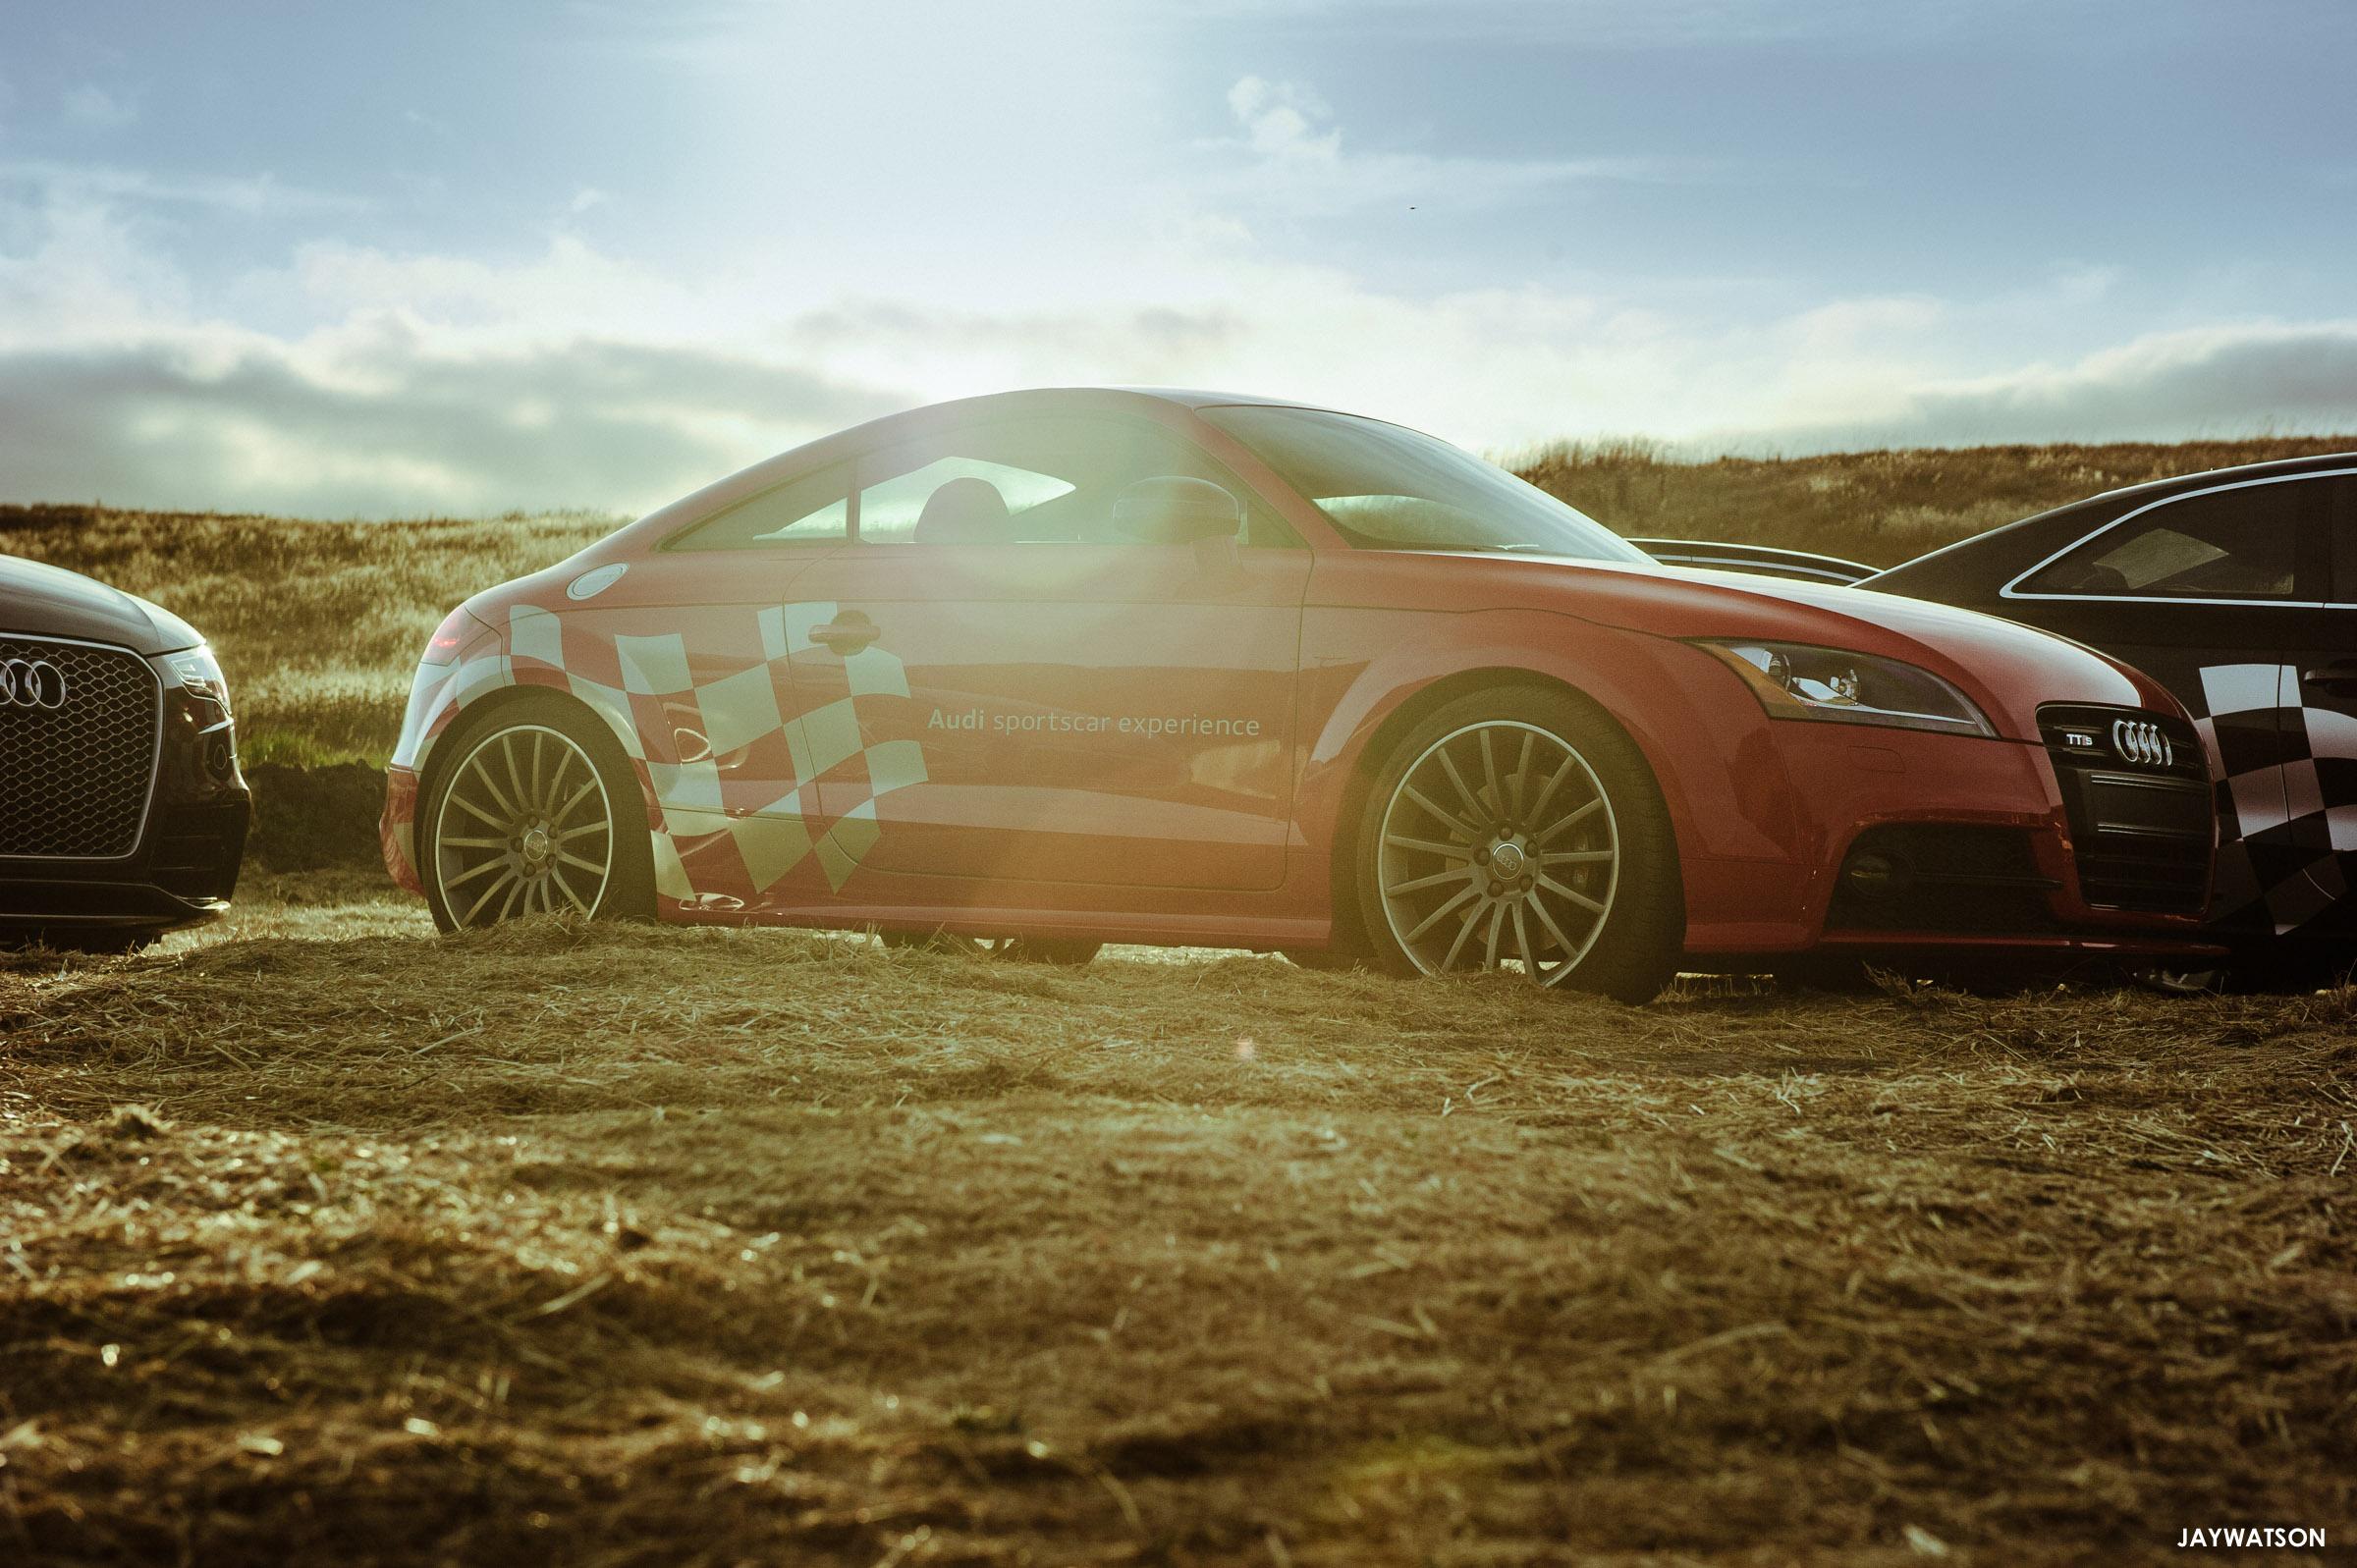 San Francisco Polo Classic Petaluma CA Audi Sporstcar Experience - Audi sf